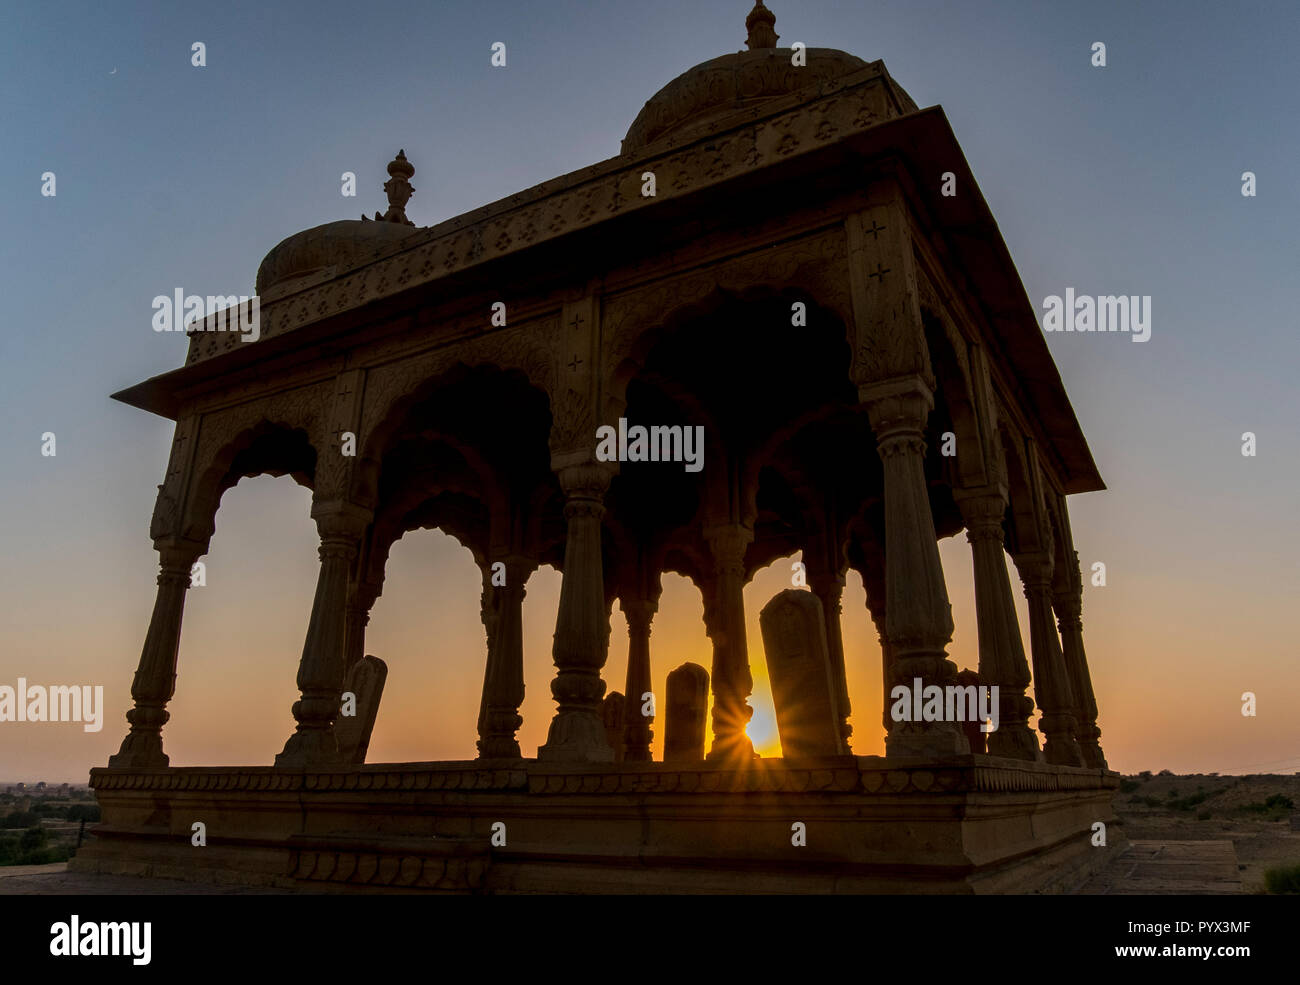 The royal cenotaphs of Bada Bagh, near Jaisalmer, India - Stock Image